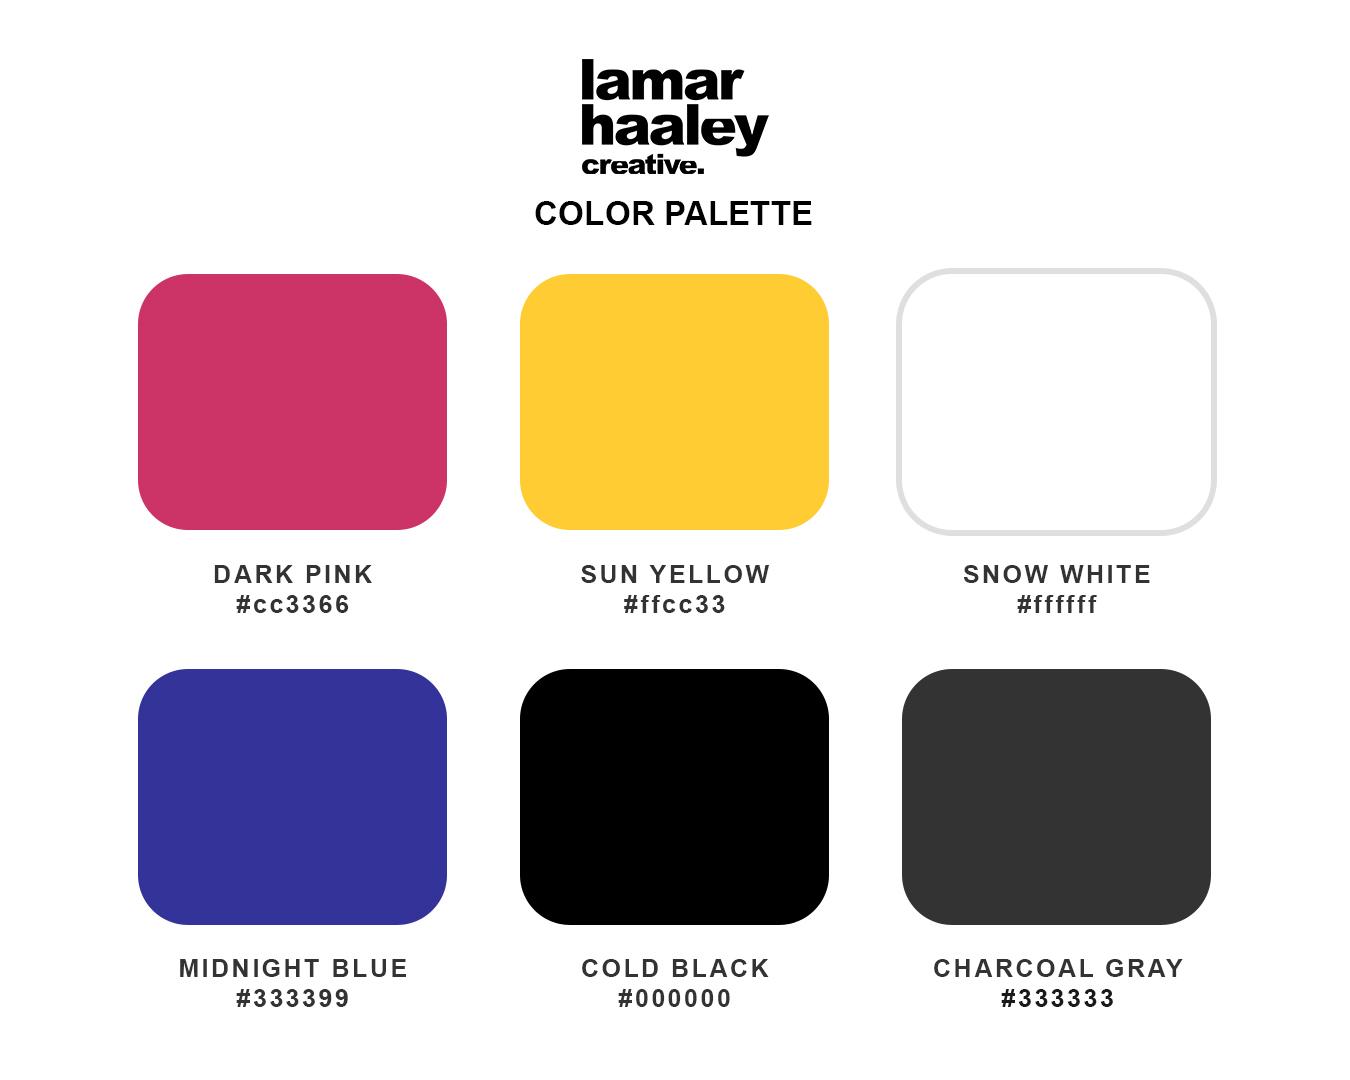 Lamar Haaley Creative - Color Palette.jpg